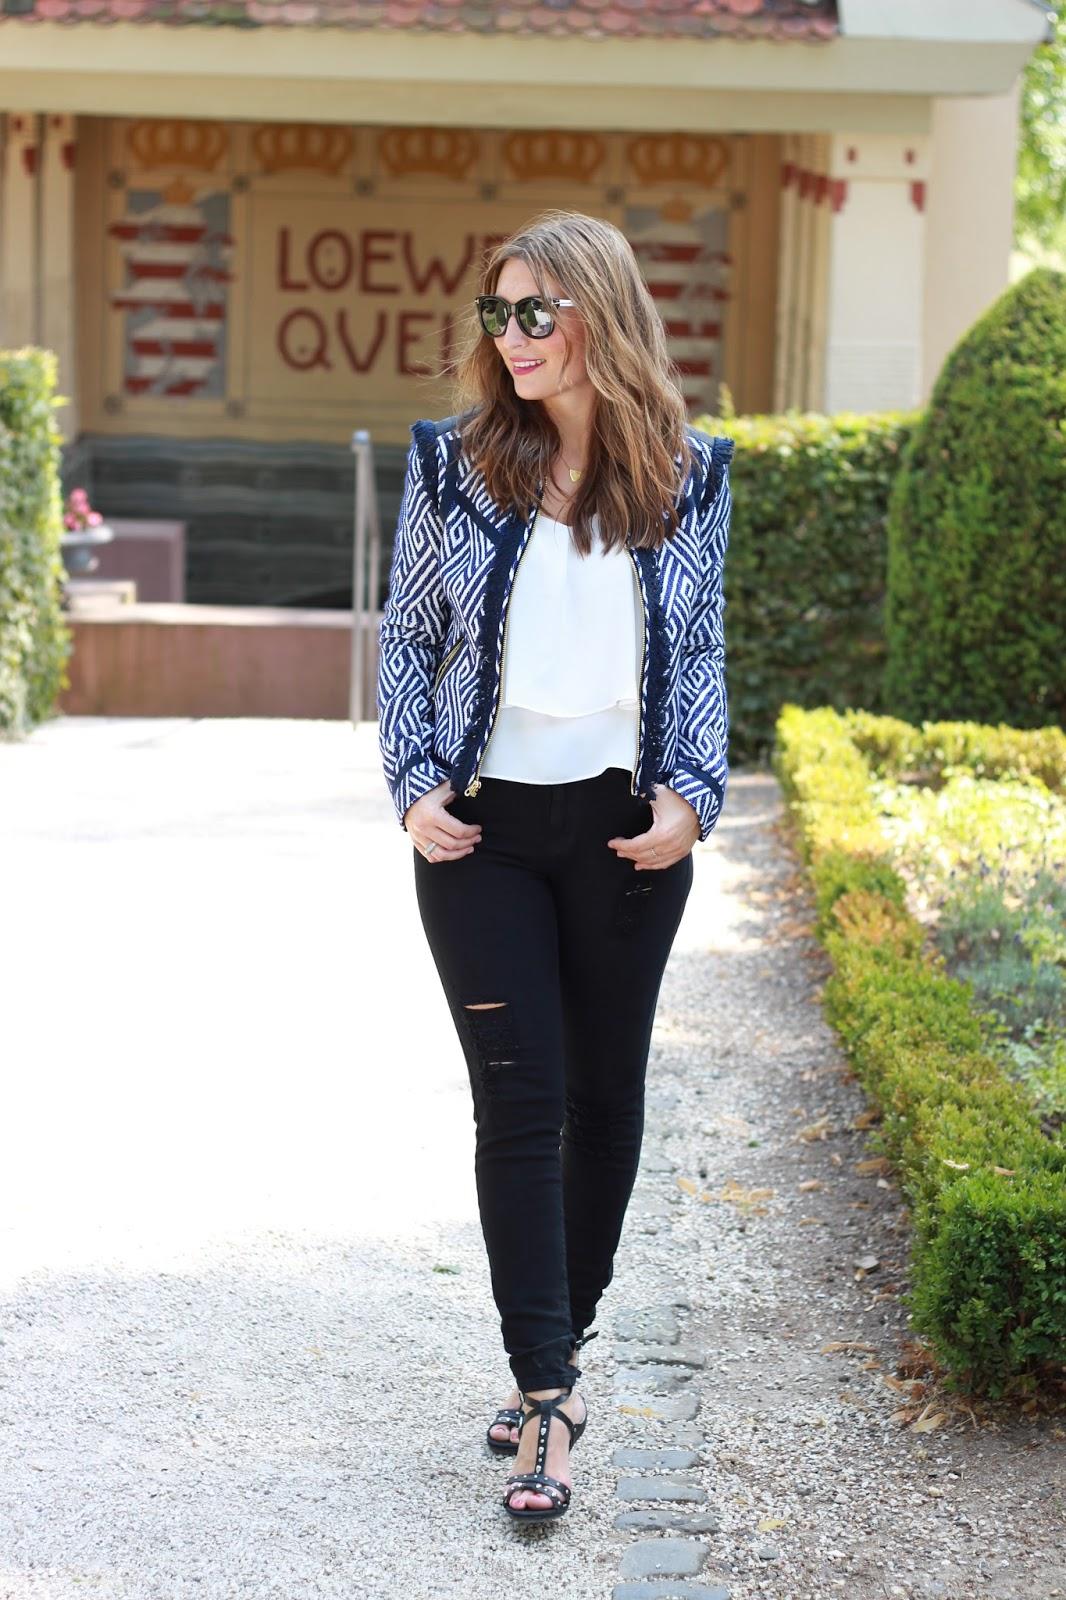 Blogger aus Frankfurt - Outfit inspiration Fashionblogger - Fashionblogger in ripped Jeans - Ripped Jeans Blogger - Replay Schuhe Blogger